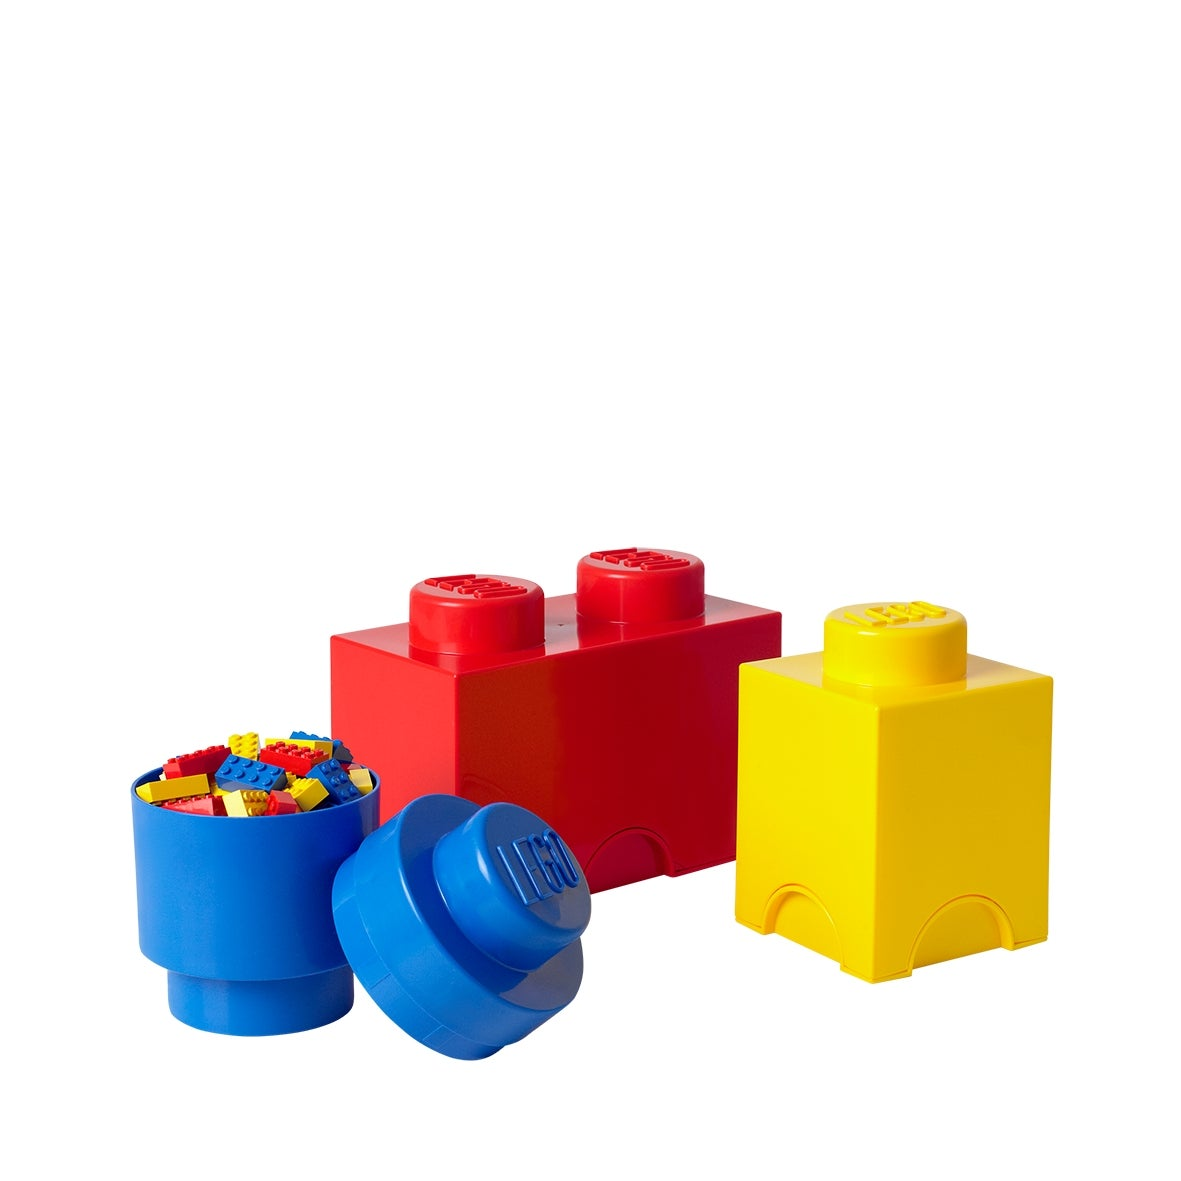 4 x lego red slope brick triple ref 3048c//set 4483 7946 4892 6482 6286 7597 7948